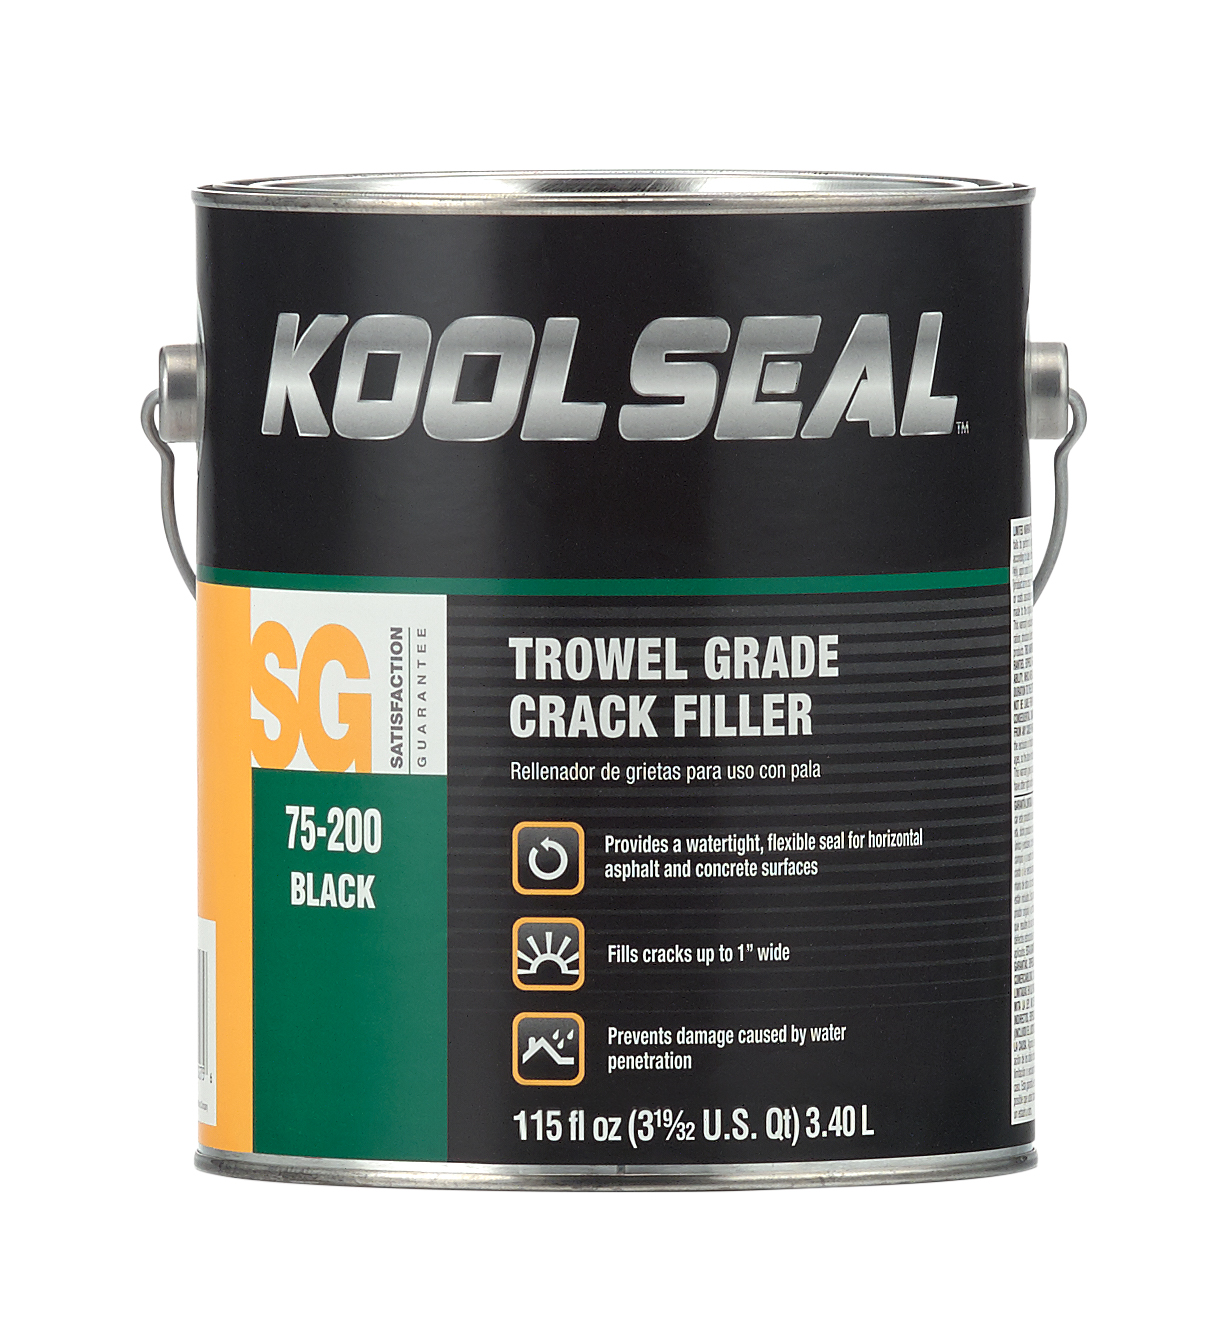 Trowel Grade Driveway Crack Filler Koolseal